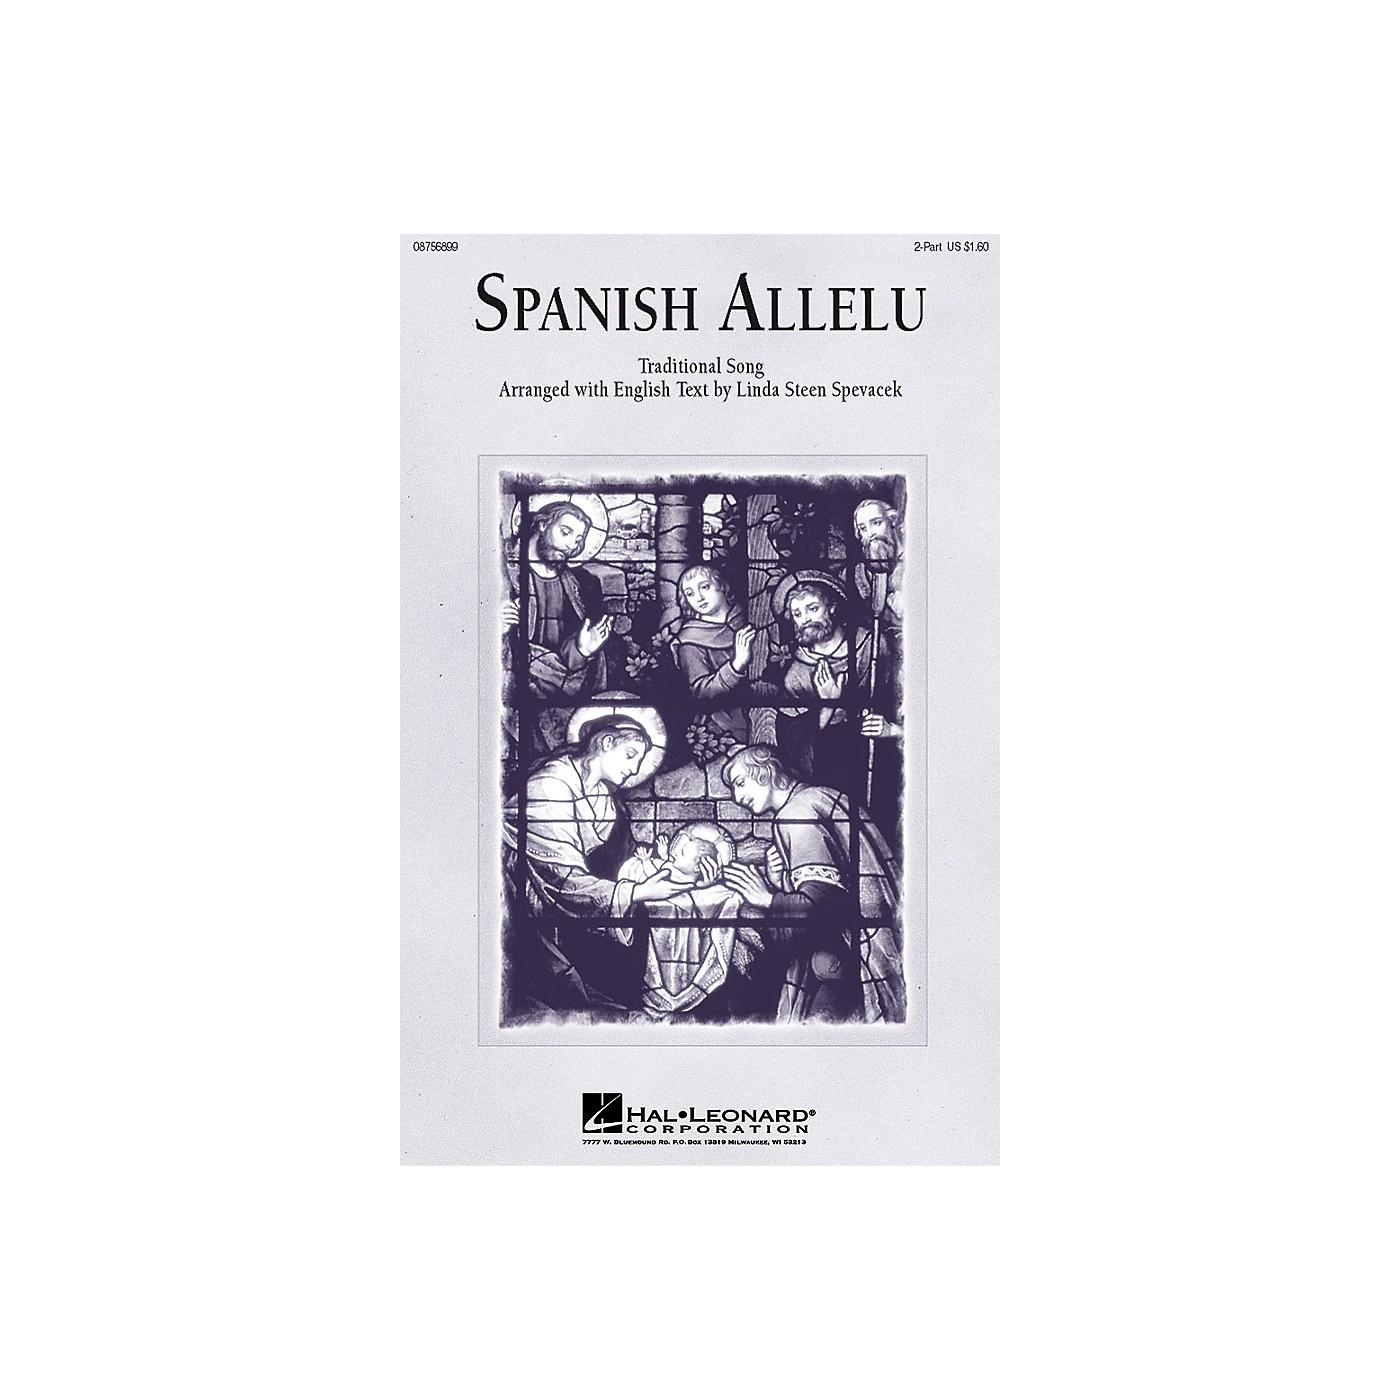 Hal Leonard Spanish Allelu 2-Part arranged by Linda Spevacek thumbnail